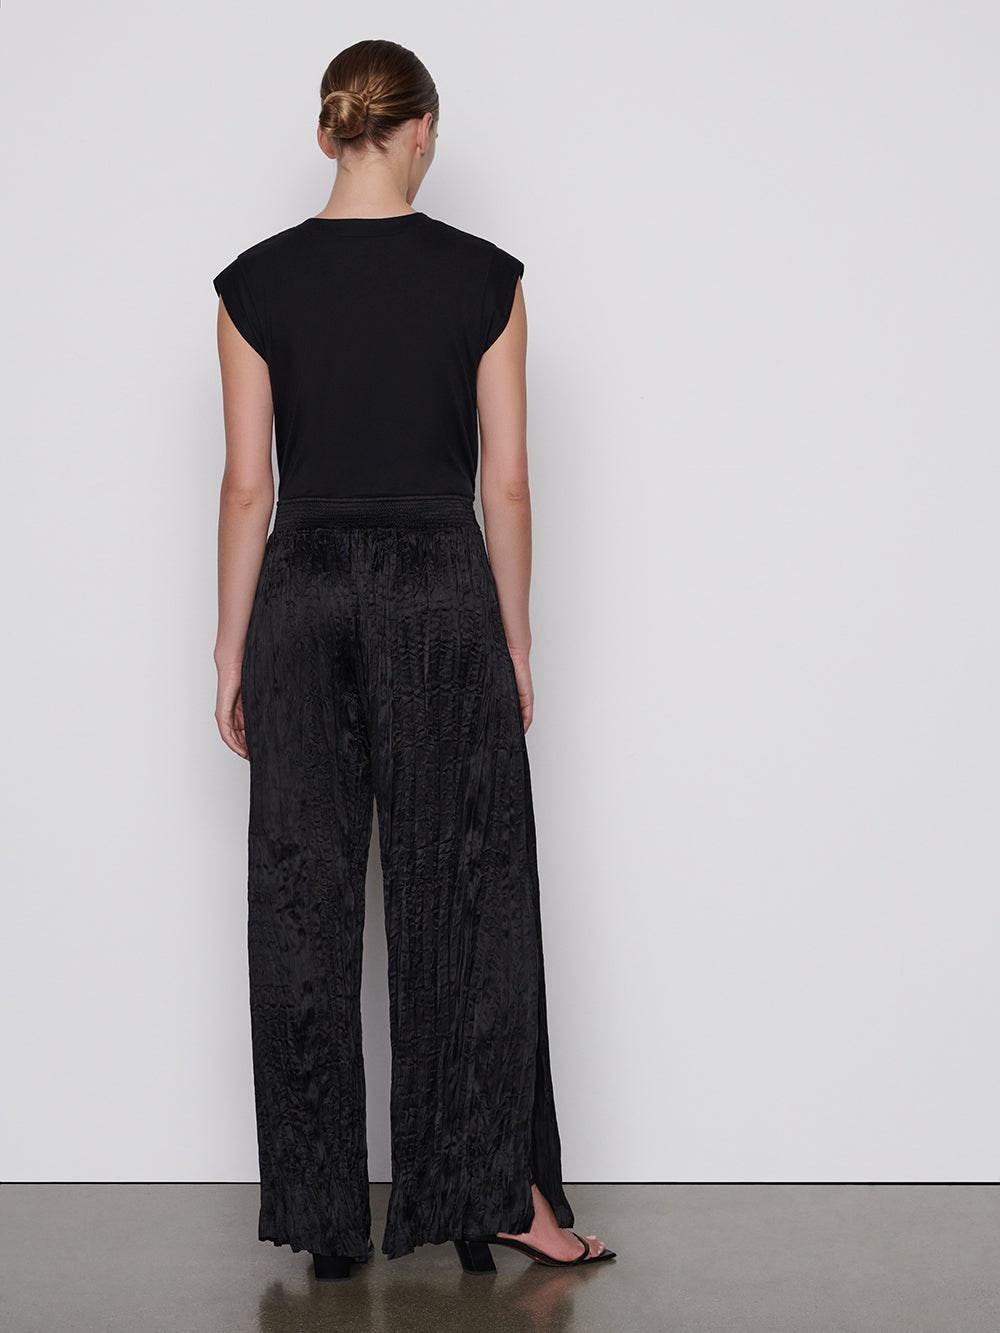 pants back view